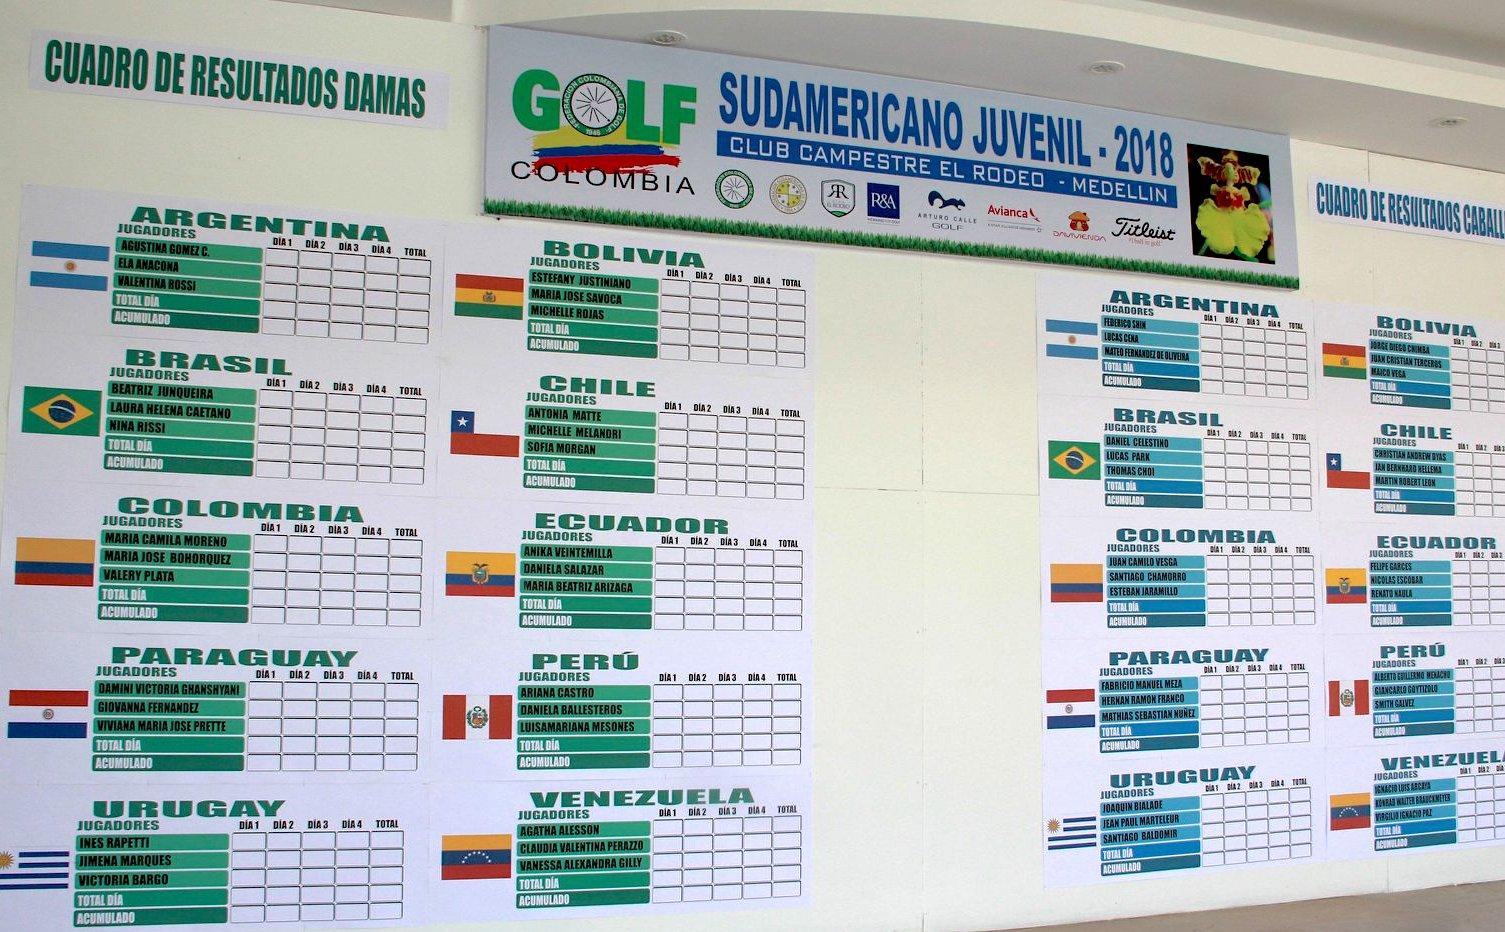 suda juvenil 2018